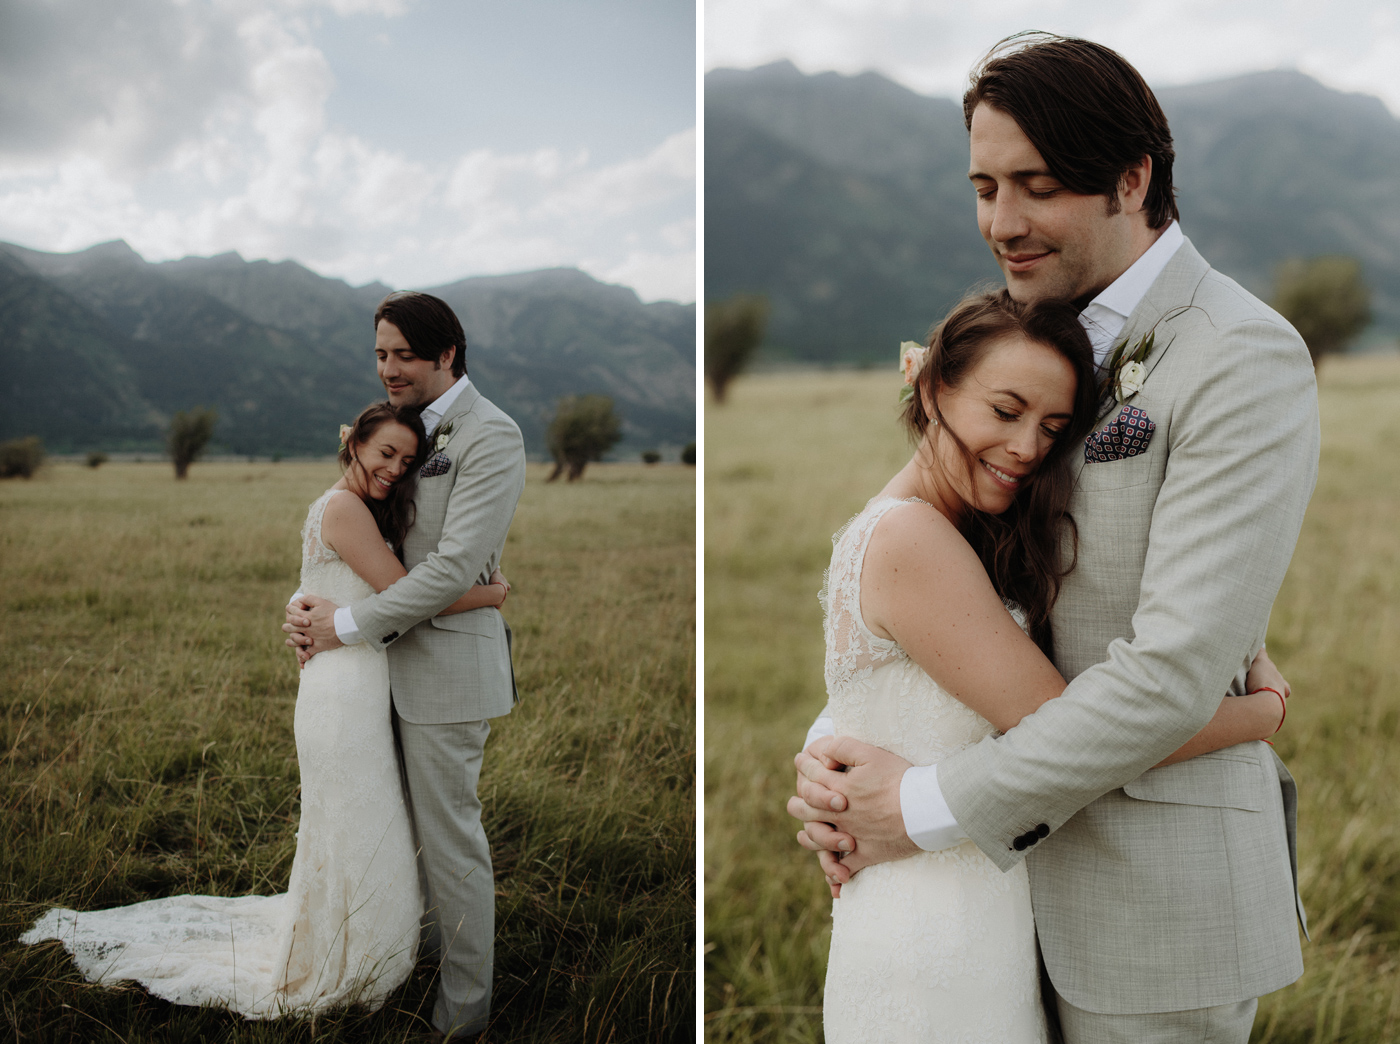 053-grand-teton-jackson-hole-wyoming-wedding.jpg